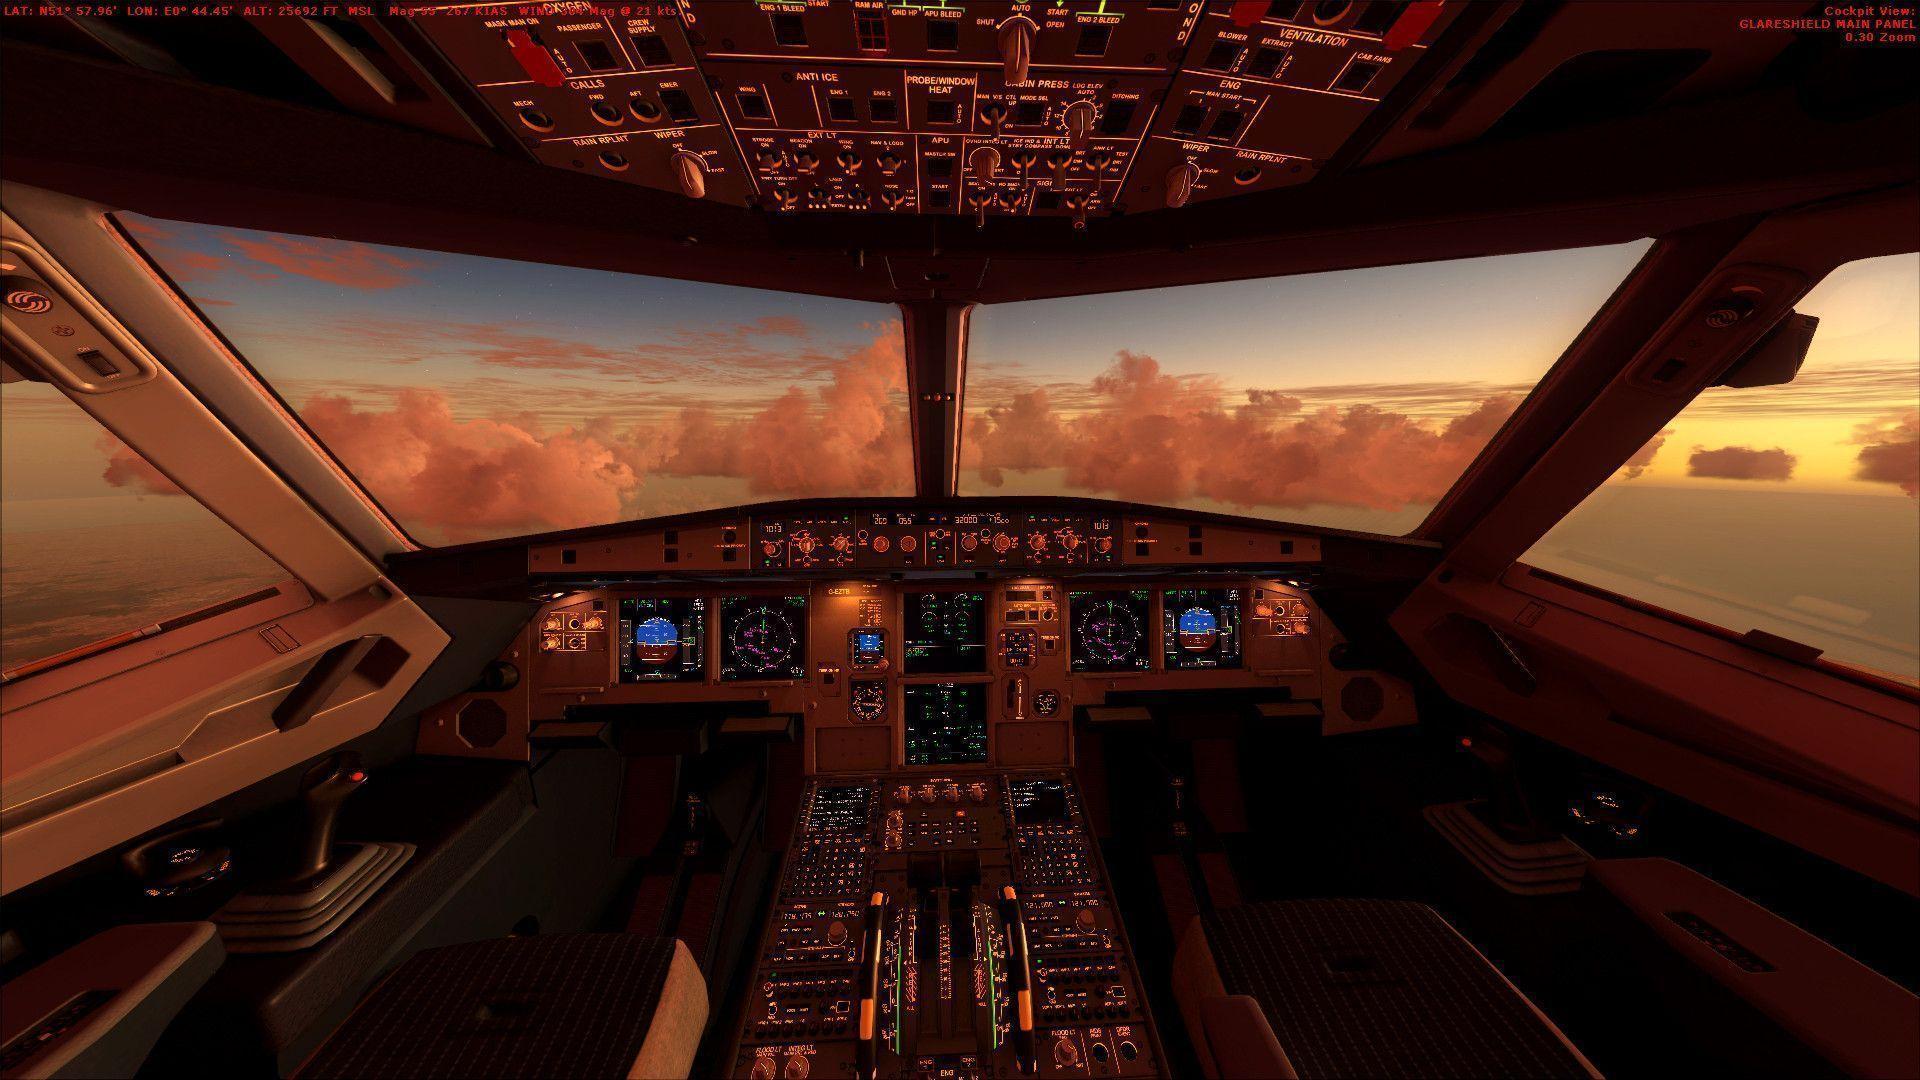 beautiful aircraft wallpaper view - photo #43